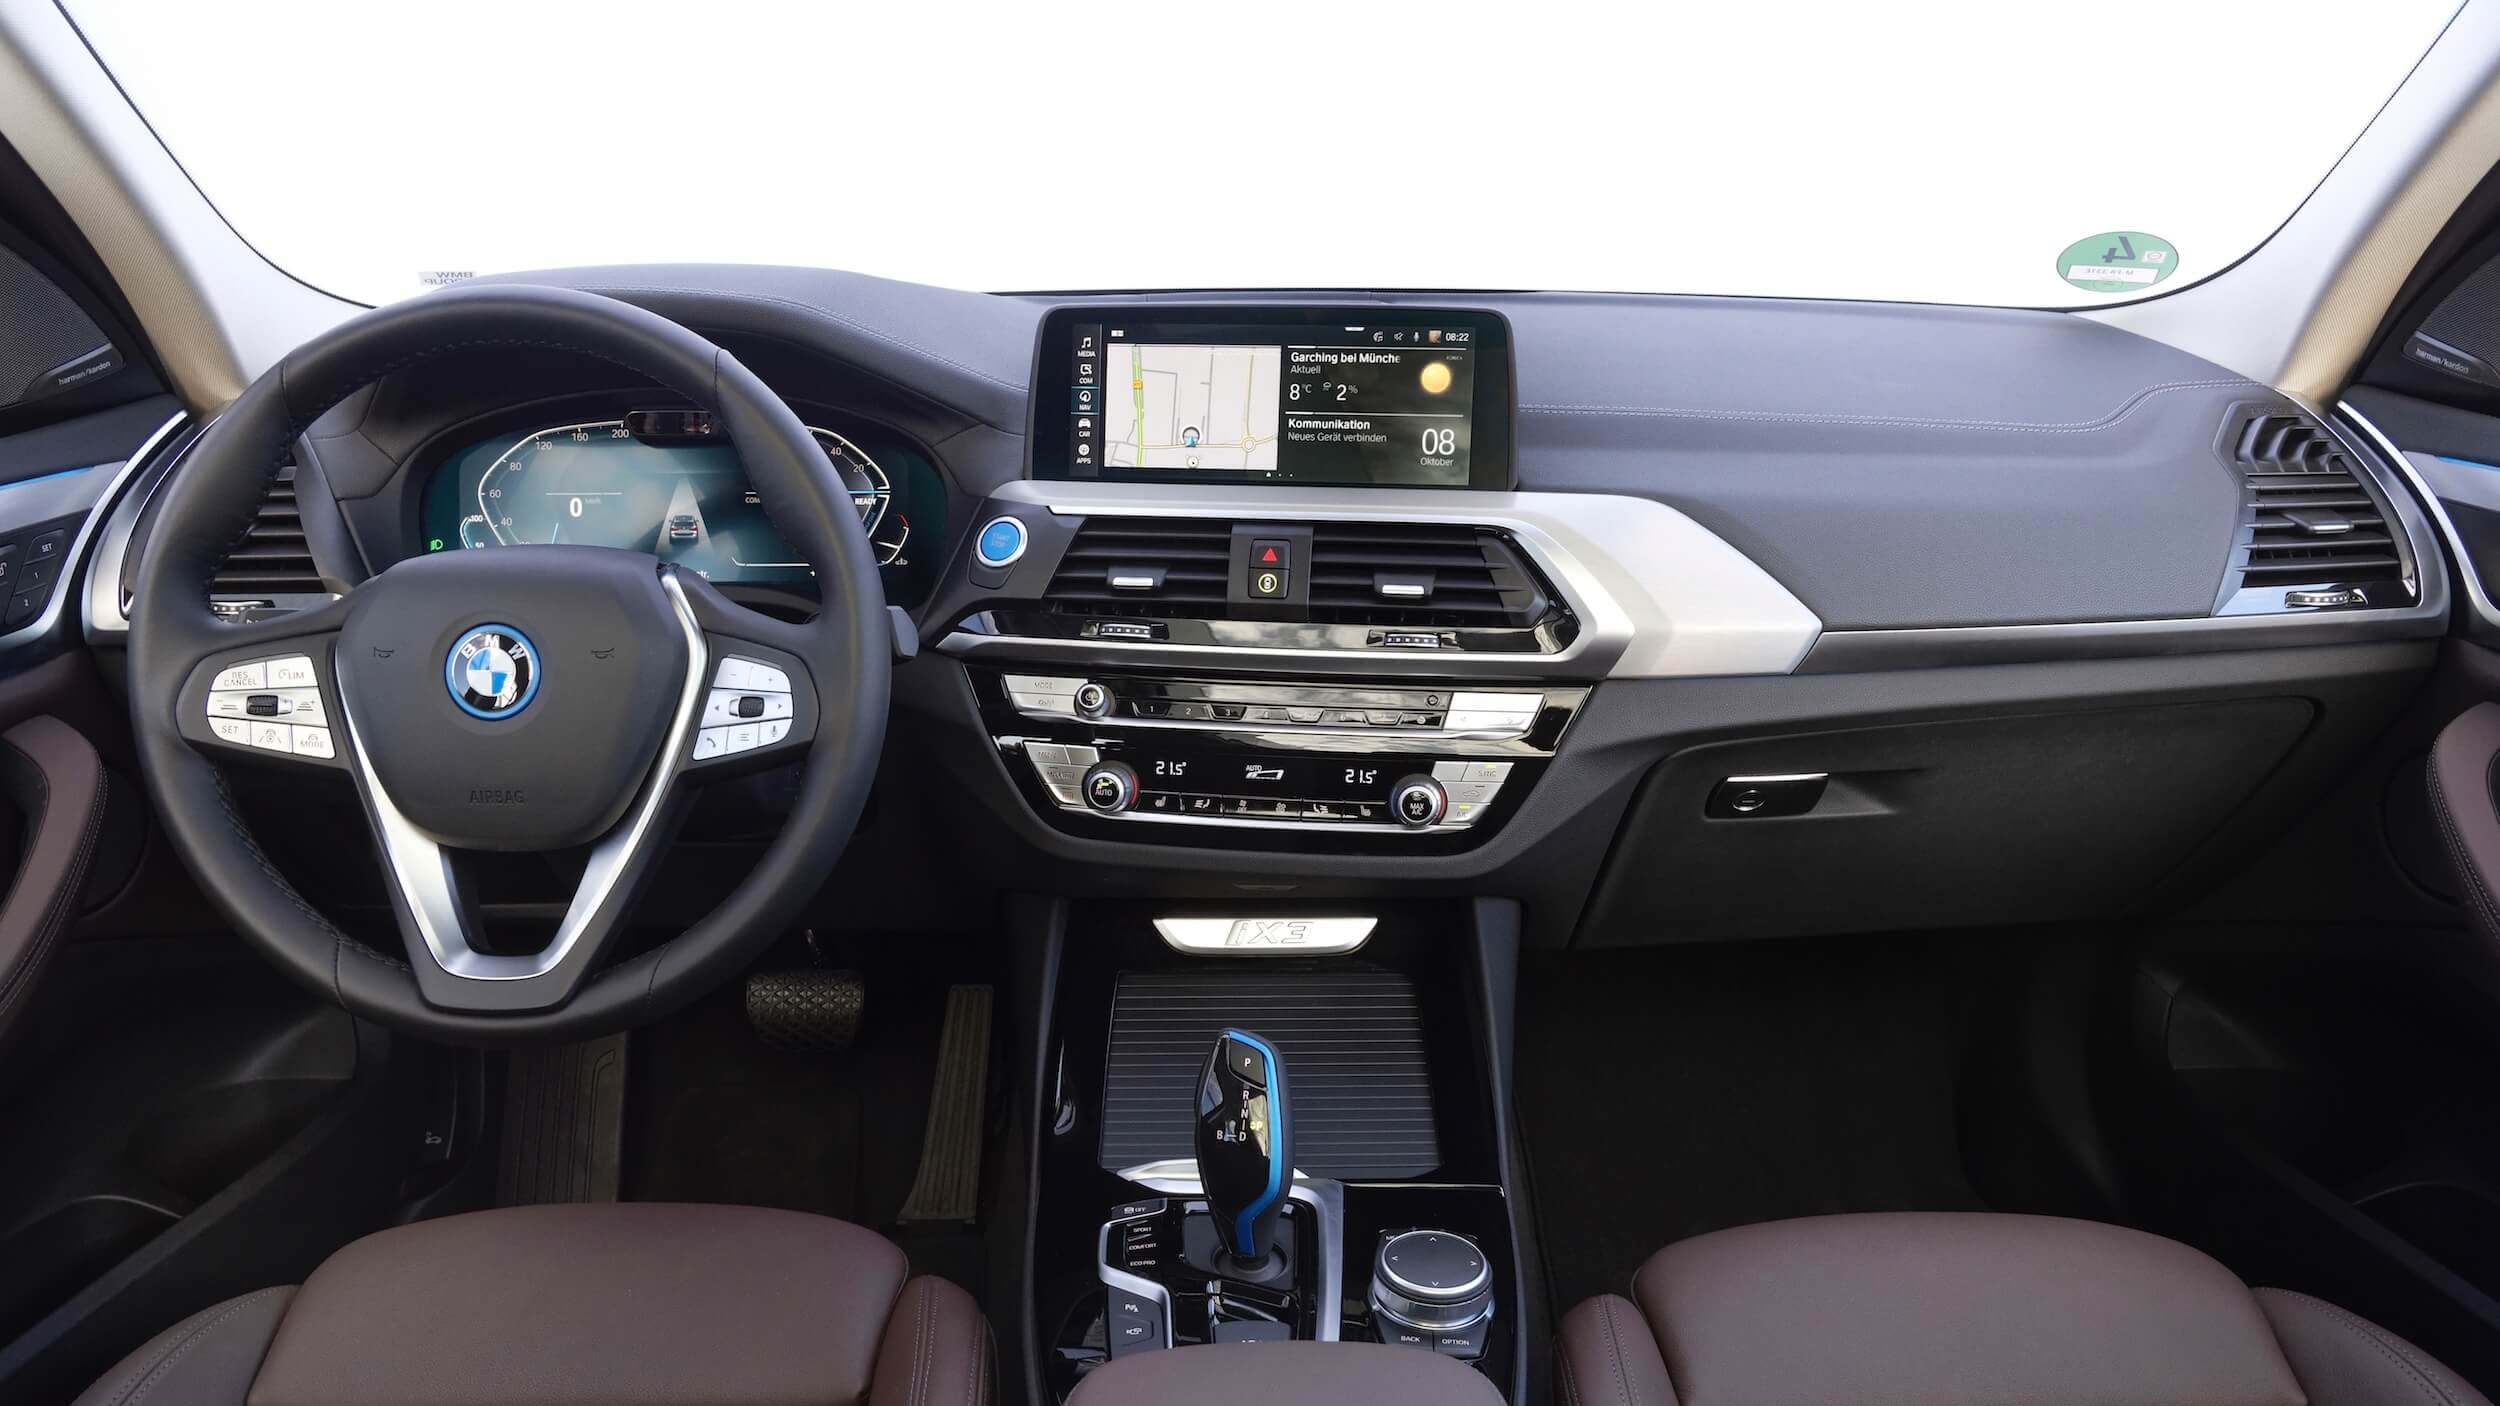 BMW iX3 interior dashboard